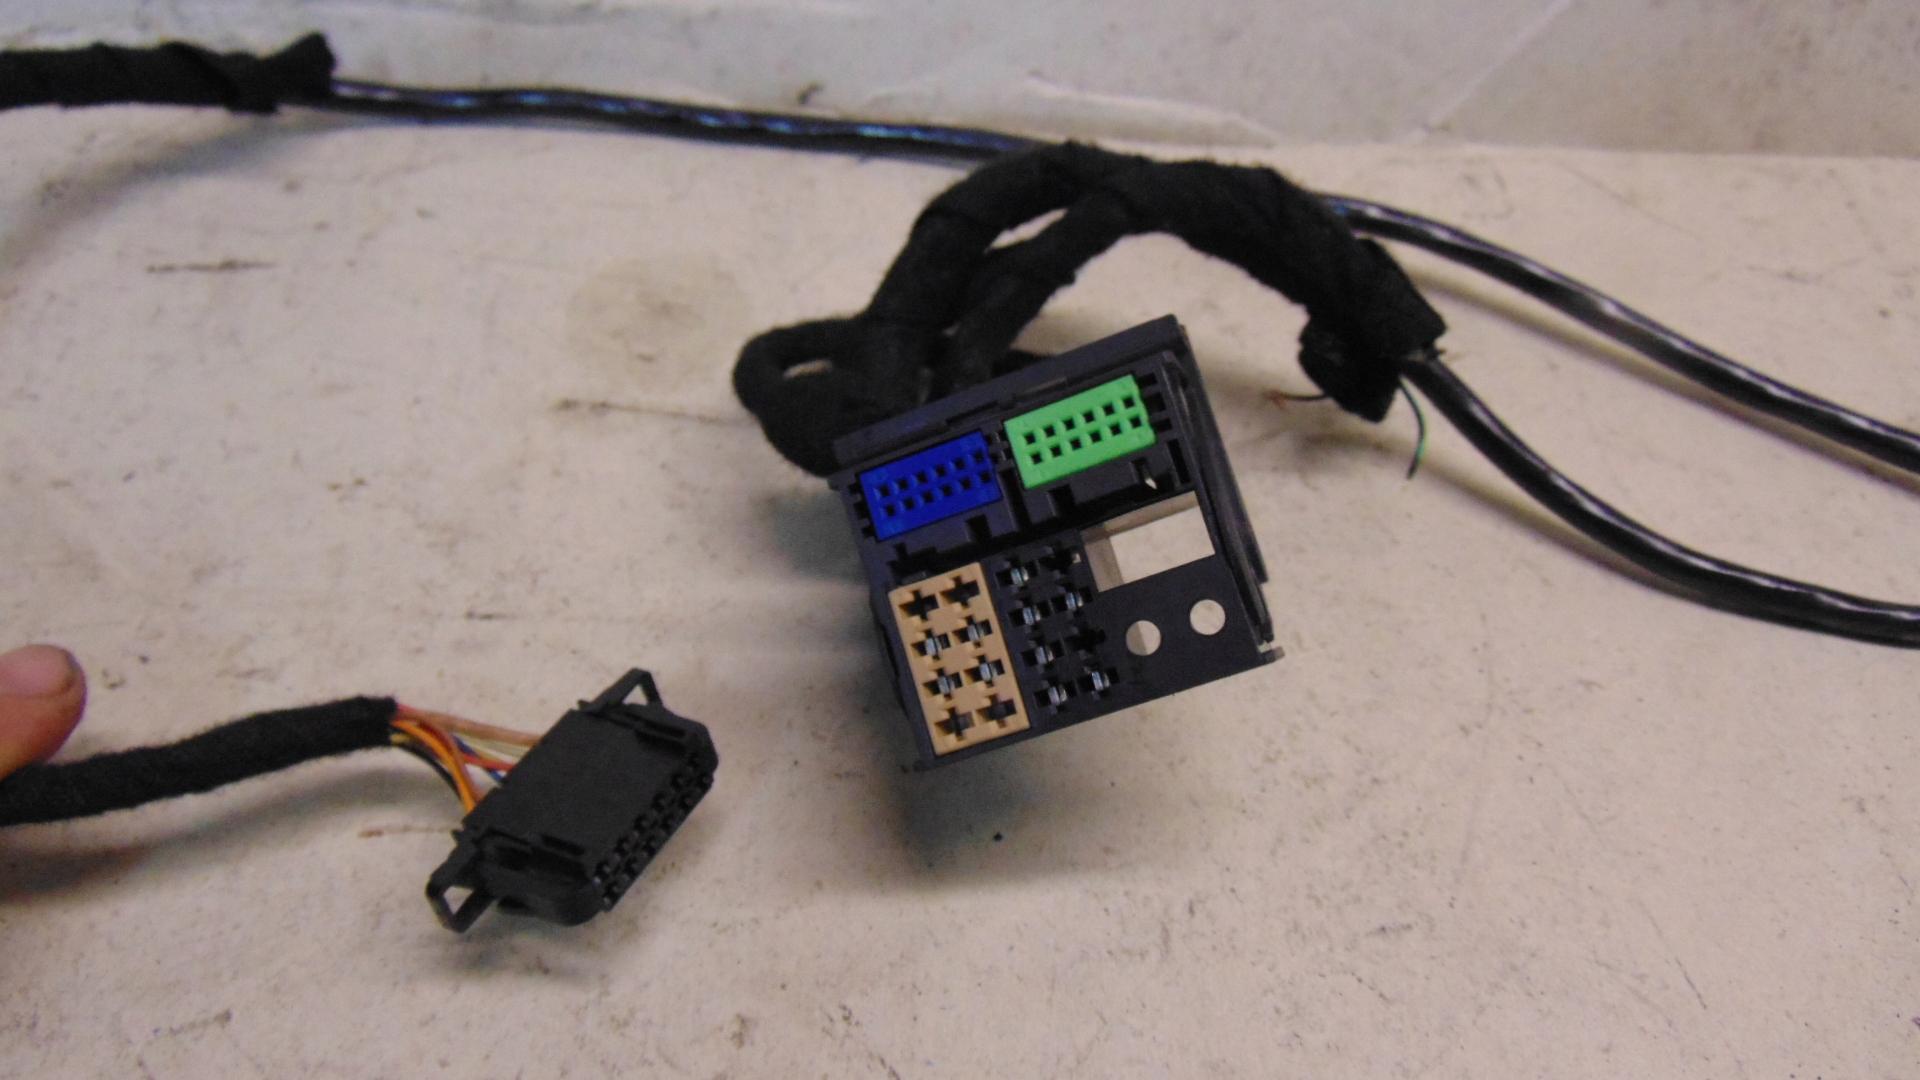 кабель кабель cd-чейнджер navi audi a4 b6 b7 rns-e